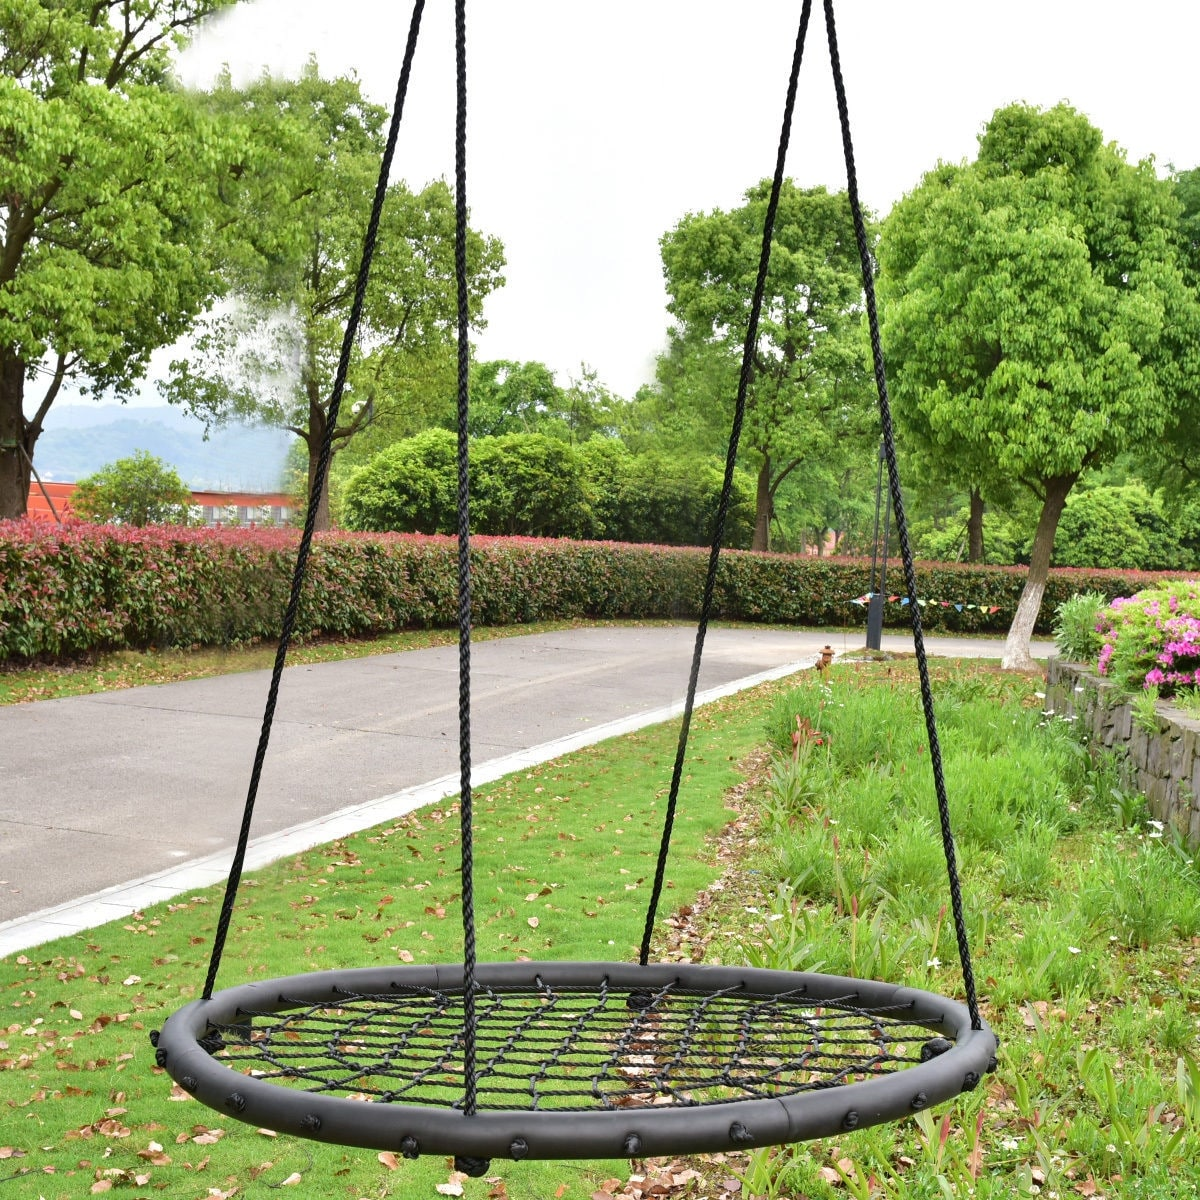 Costway 40 Kids Tree Round Swing Net Outdoor Garden Children Toddler Hanging Rope Nest Free Shipping Today 17623819